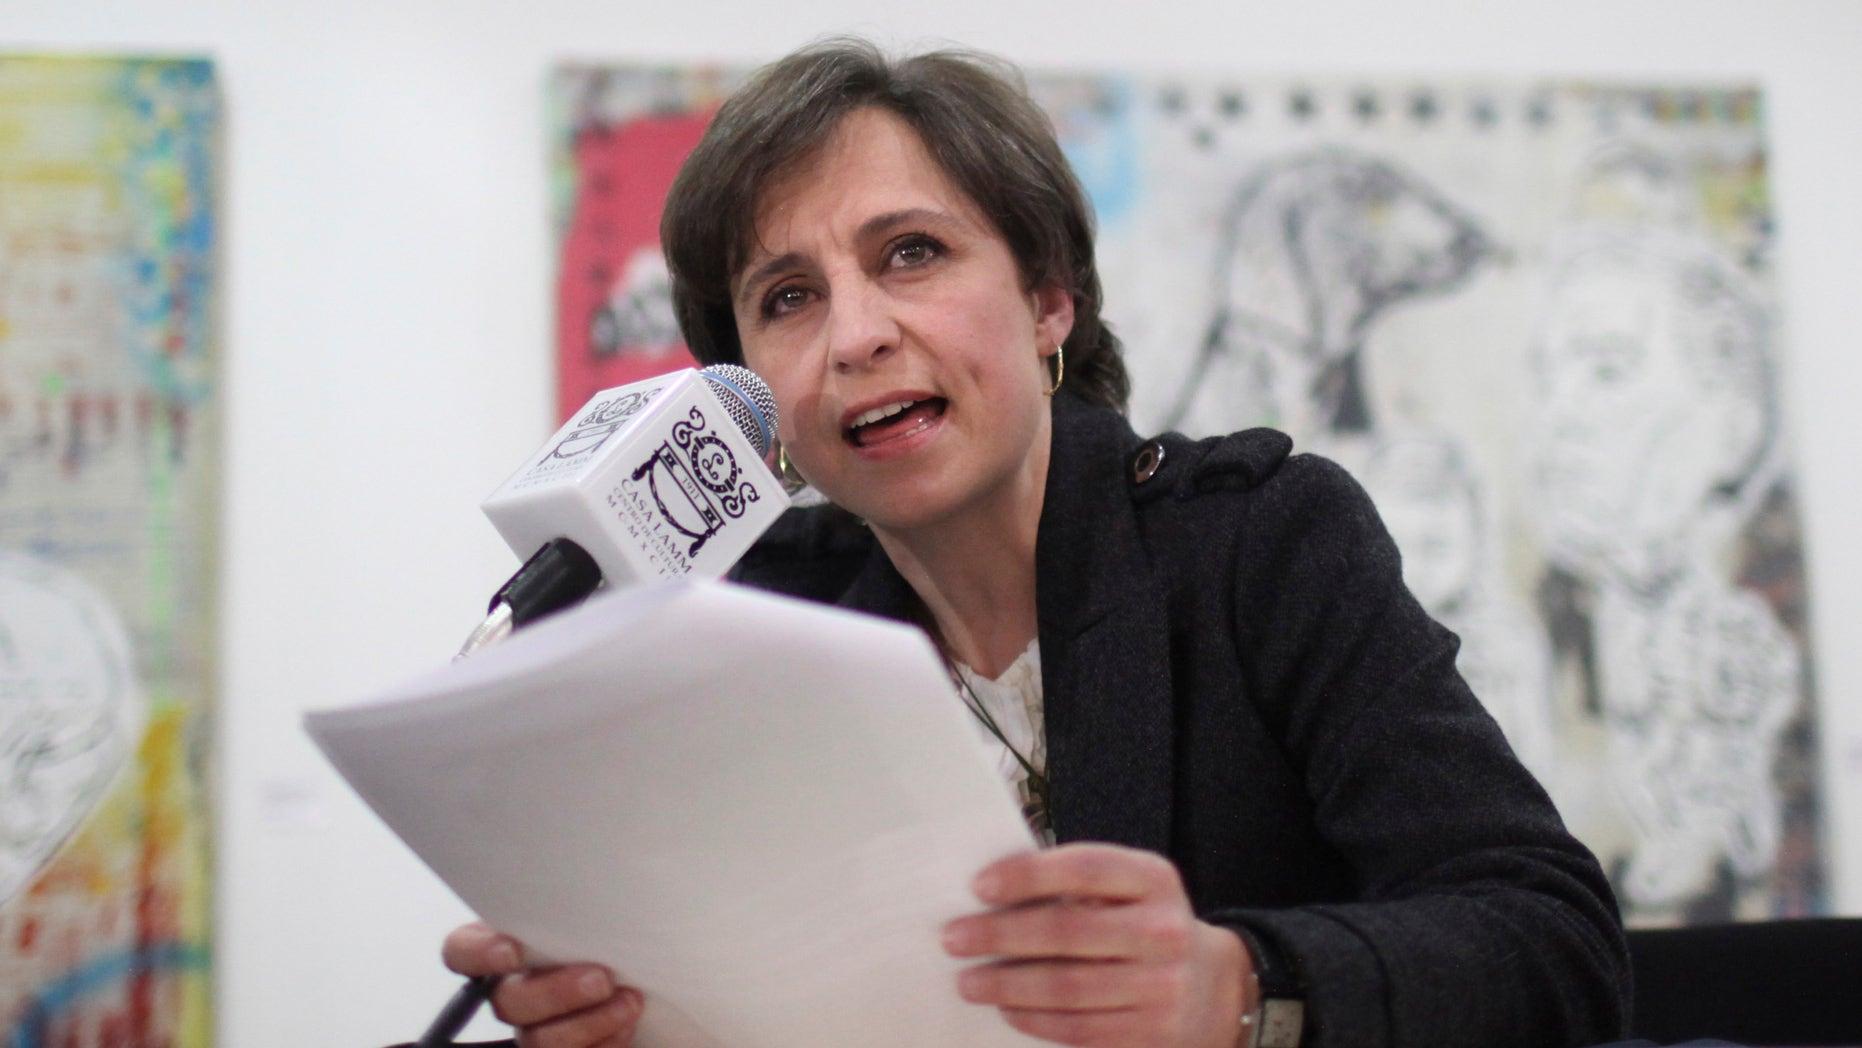 Mexican journalist Carmen Aristegui in a Feb. 9, 2011 file photo.